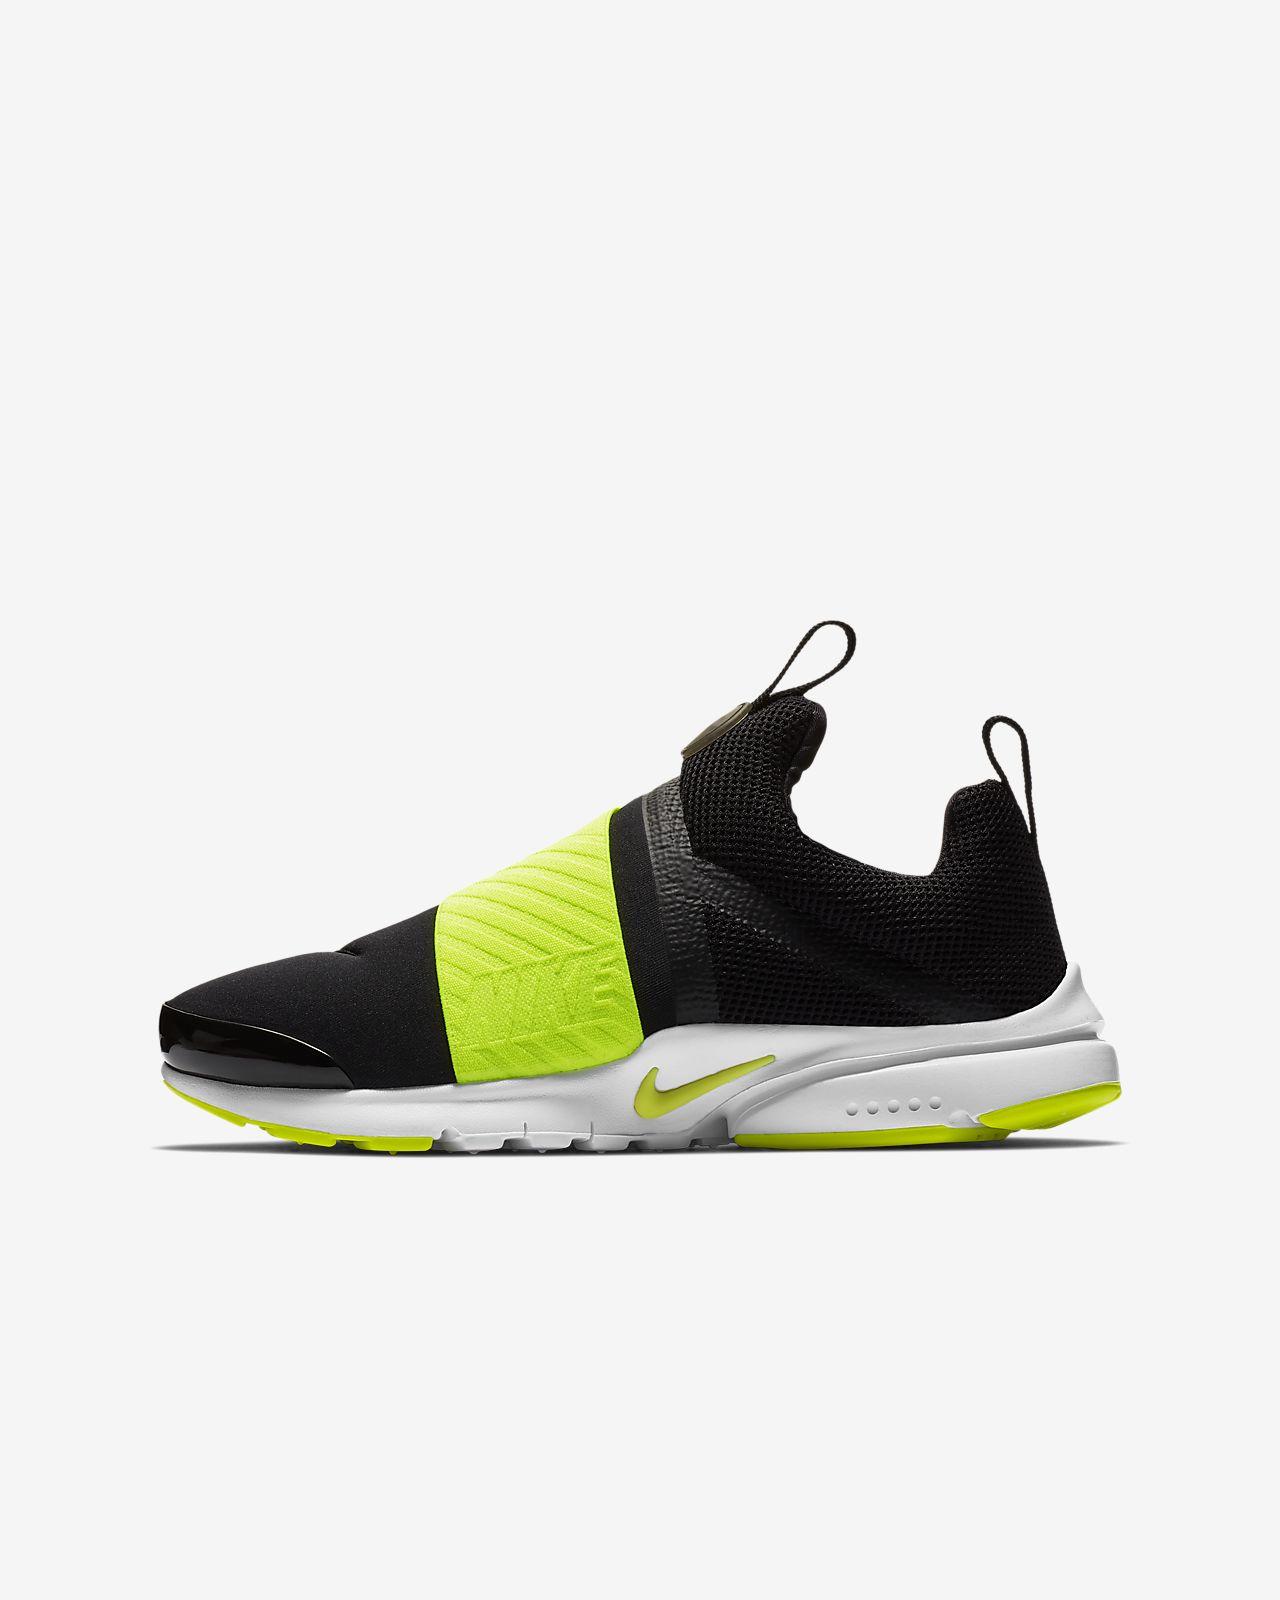 Nike Presto Extreme Big Kids Shoe Nikecom